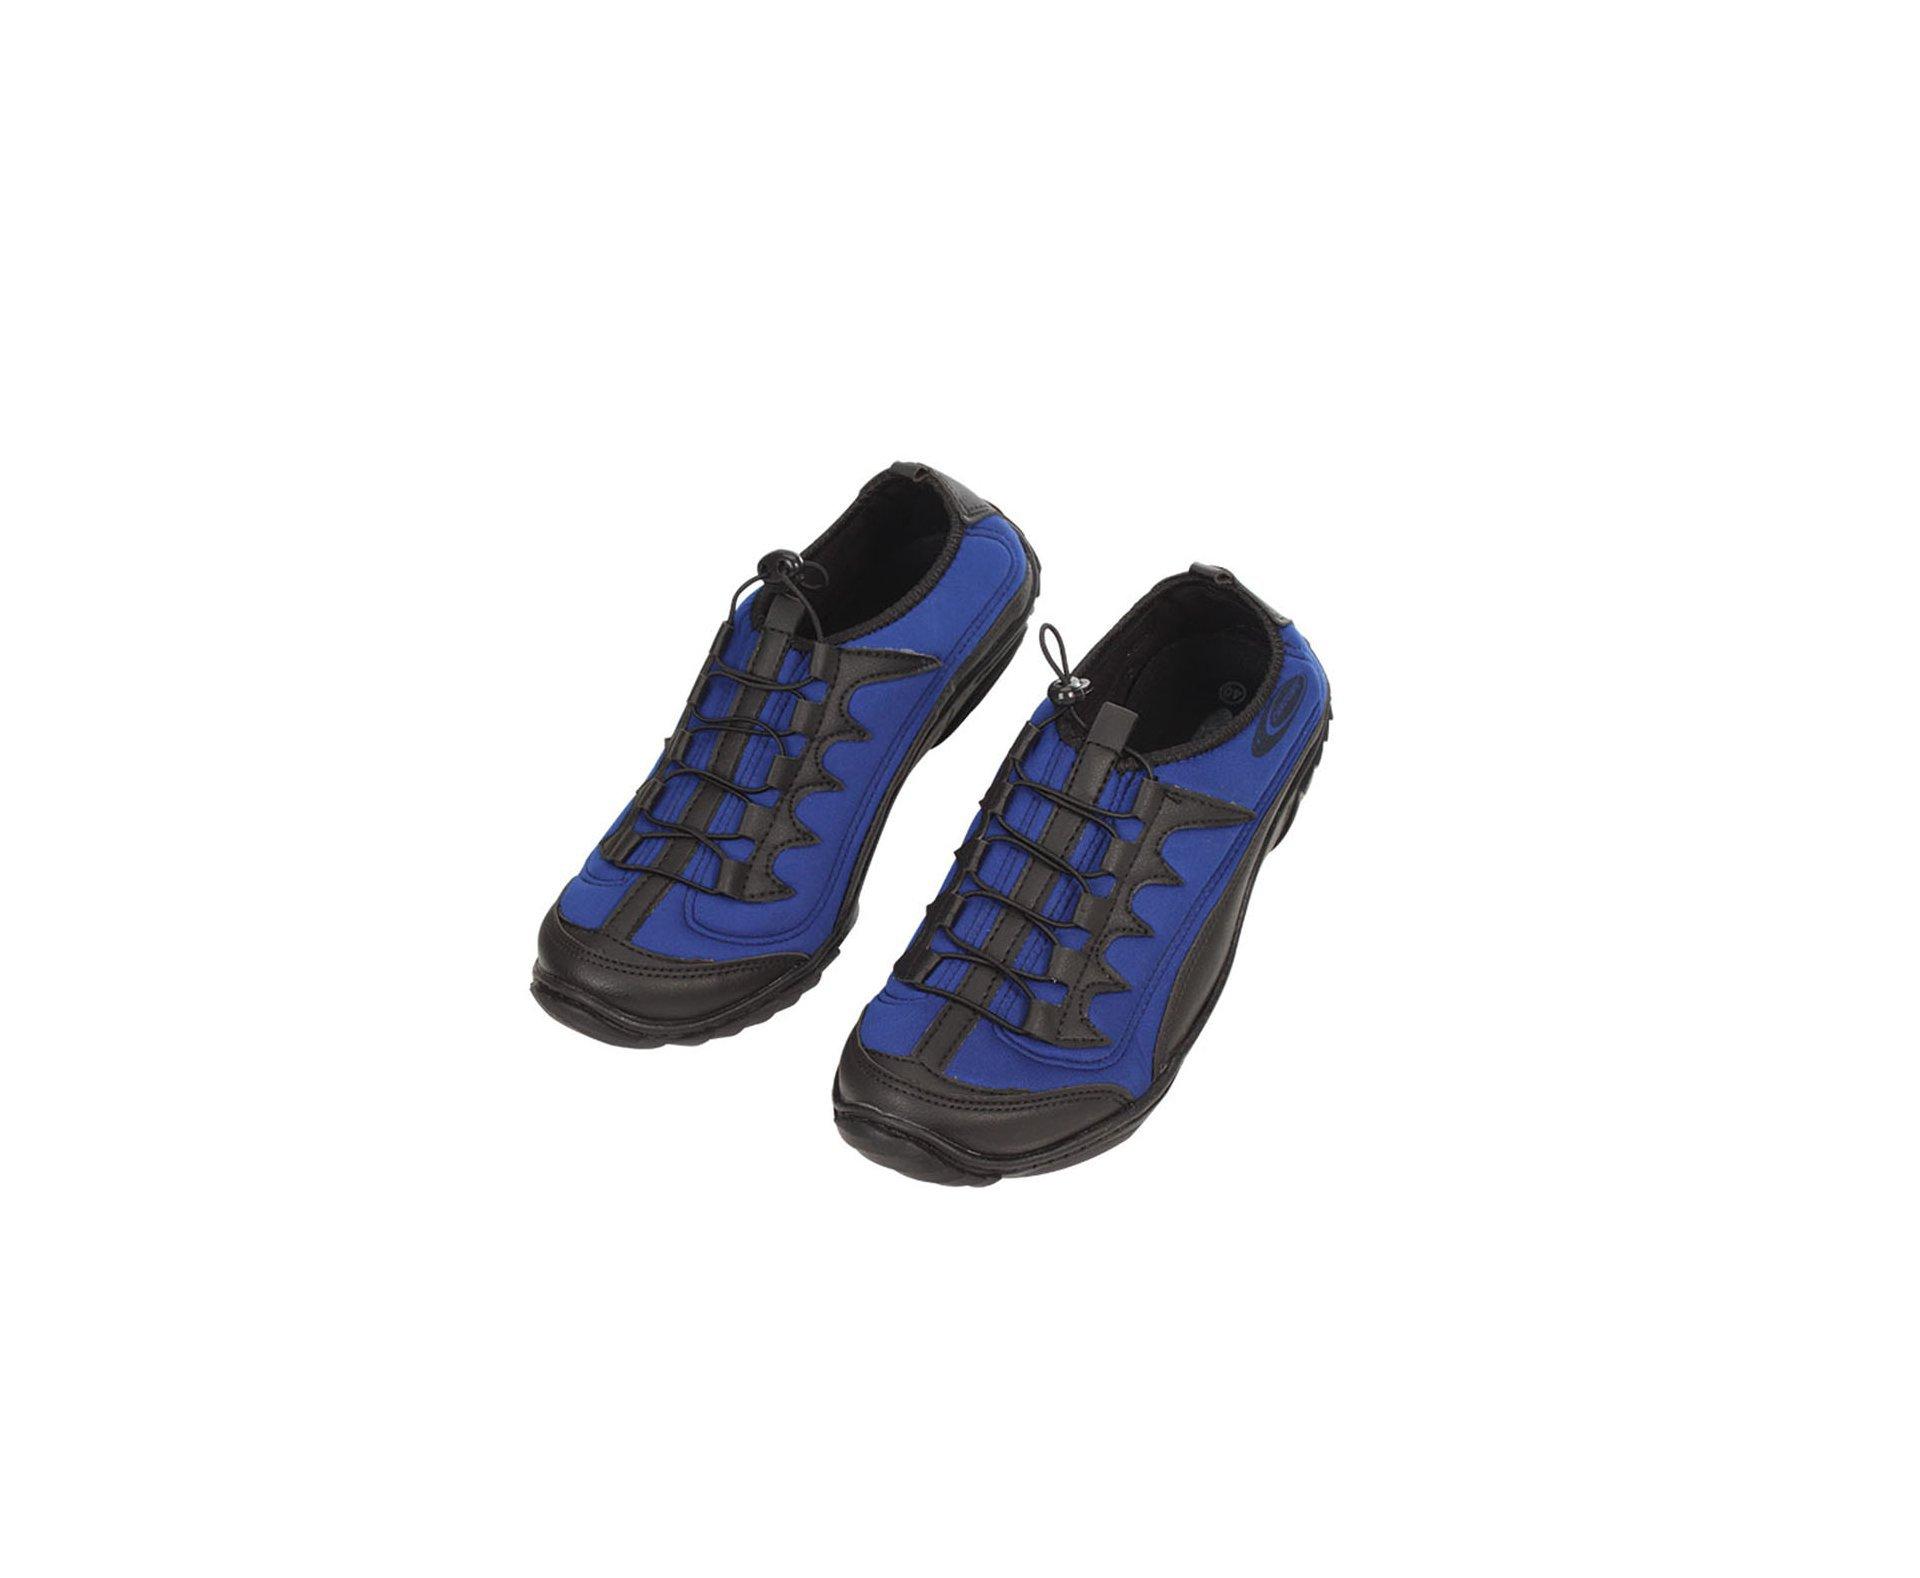 Tenis Anfibius Azul - Cardume